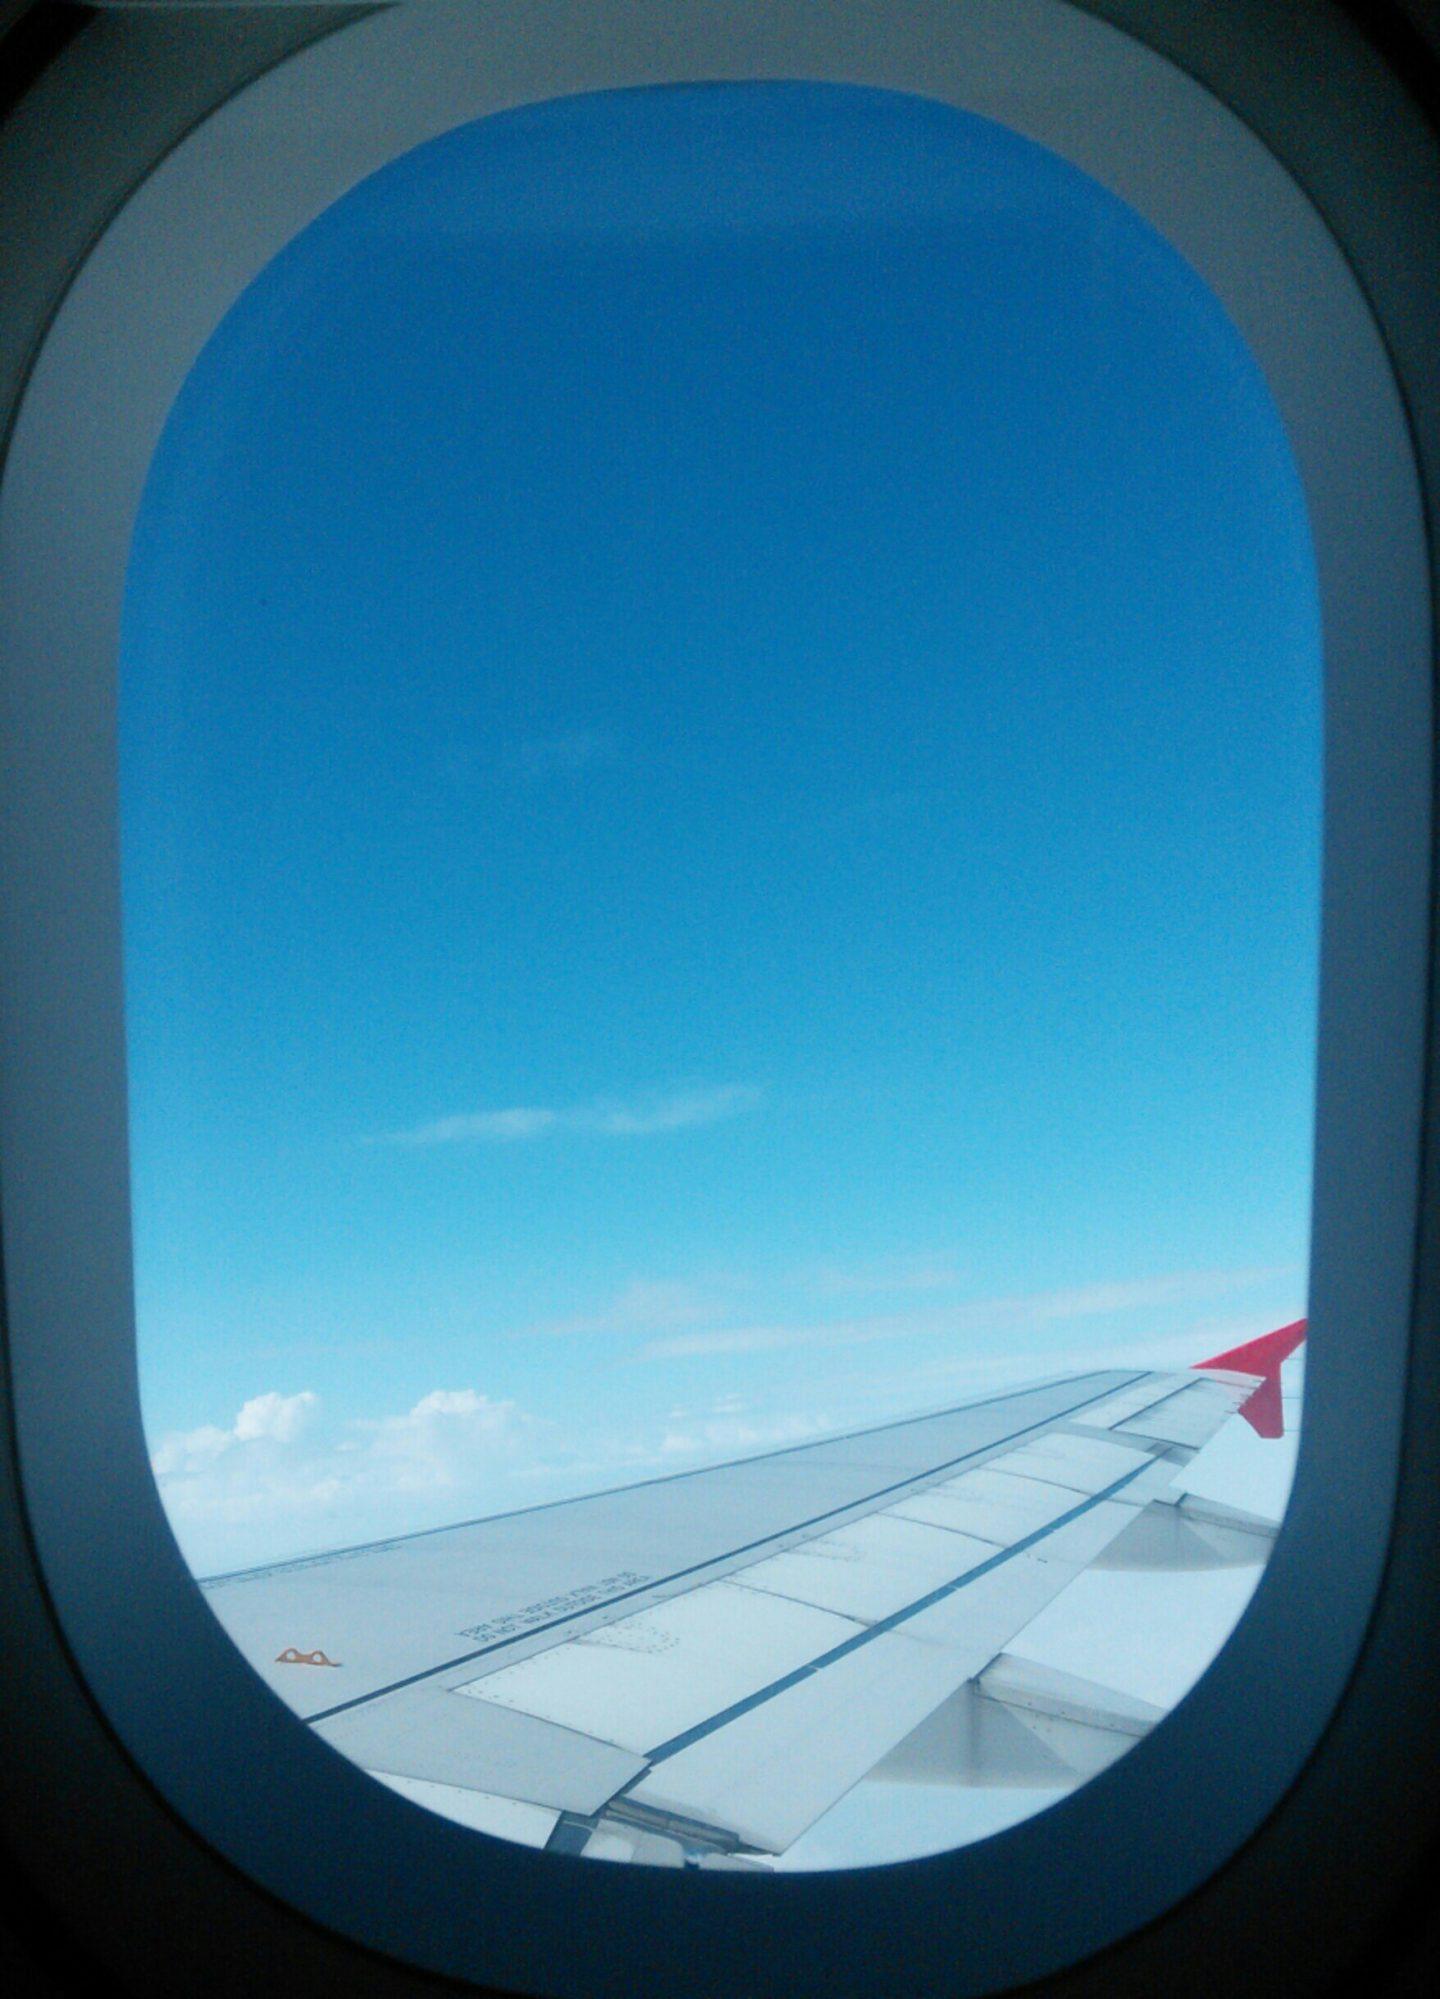 Catch Up & Chiang Mai. Goodbye, Thailand! ขอบคุณค่ะ (kob-khun-ka) for having me!